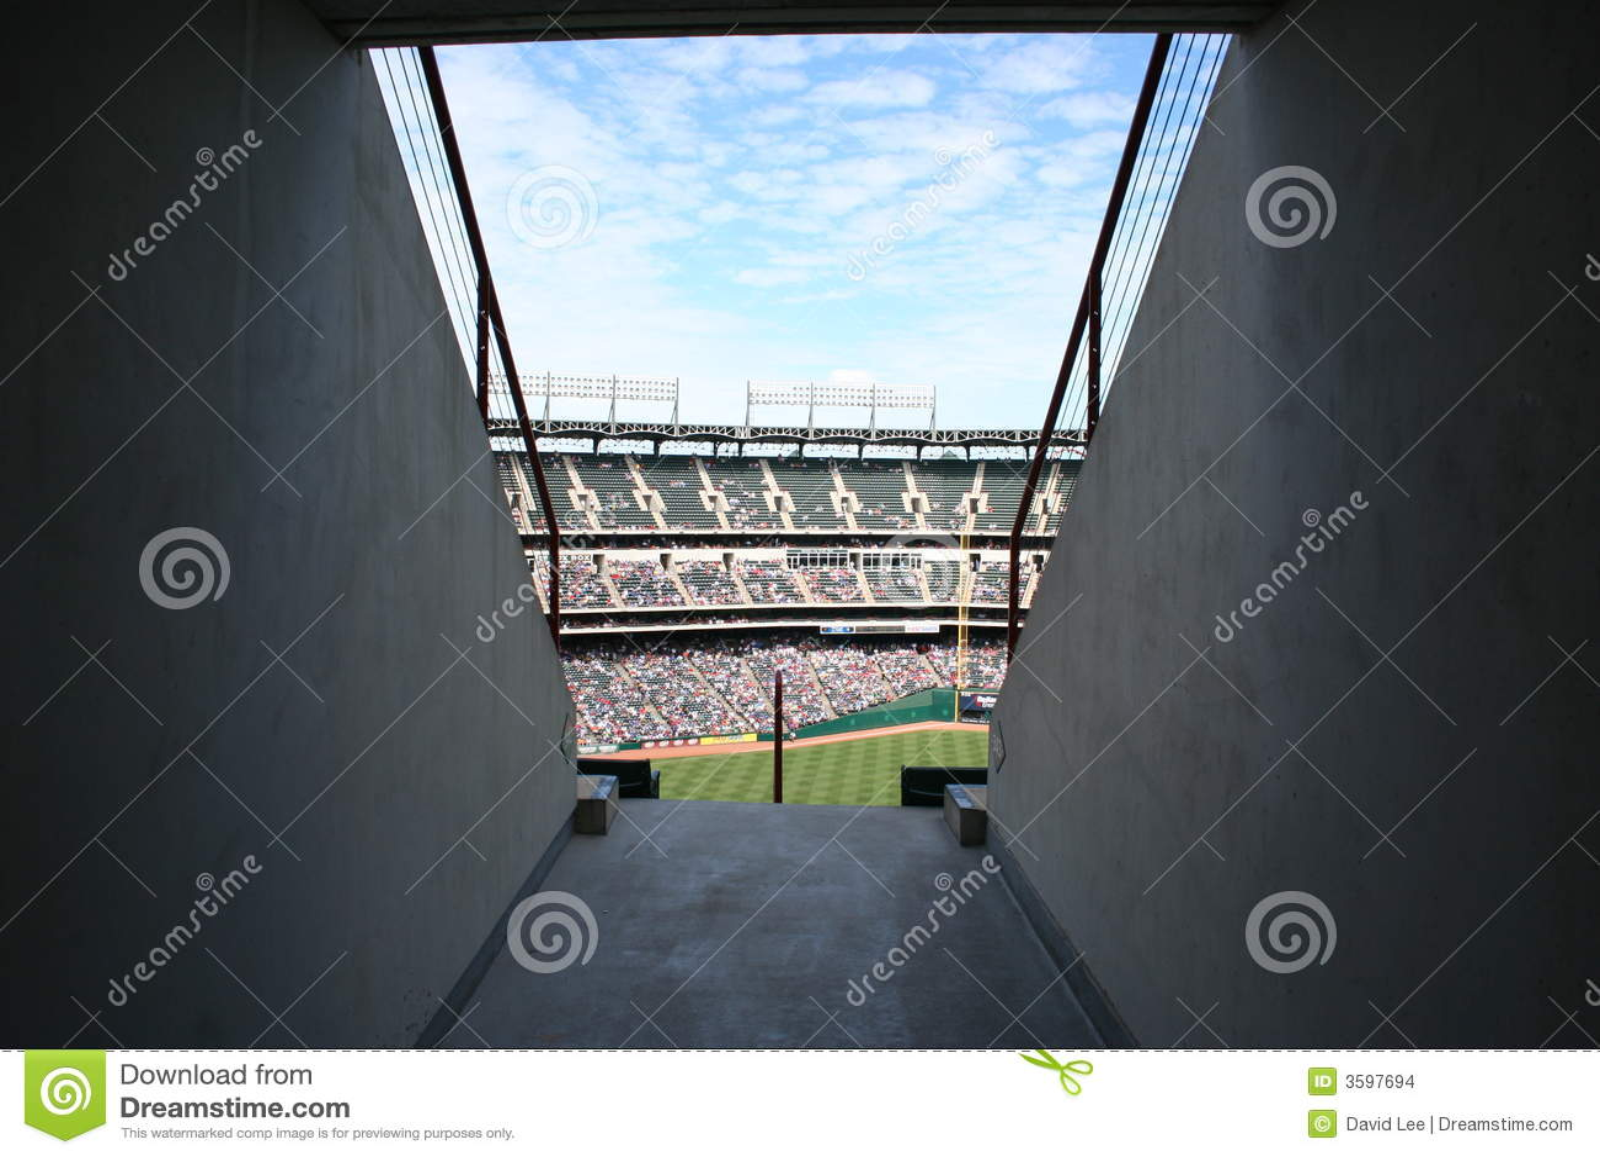 Ramp into baseball stadium